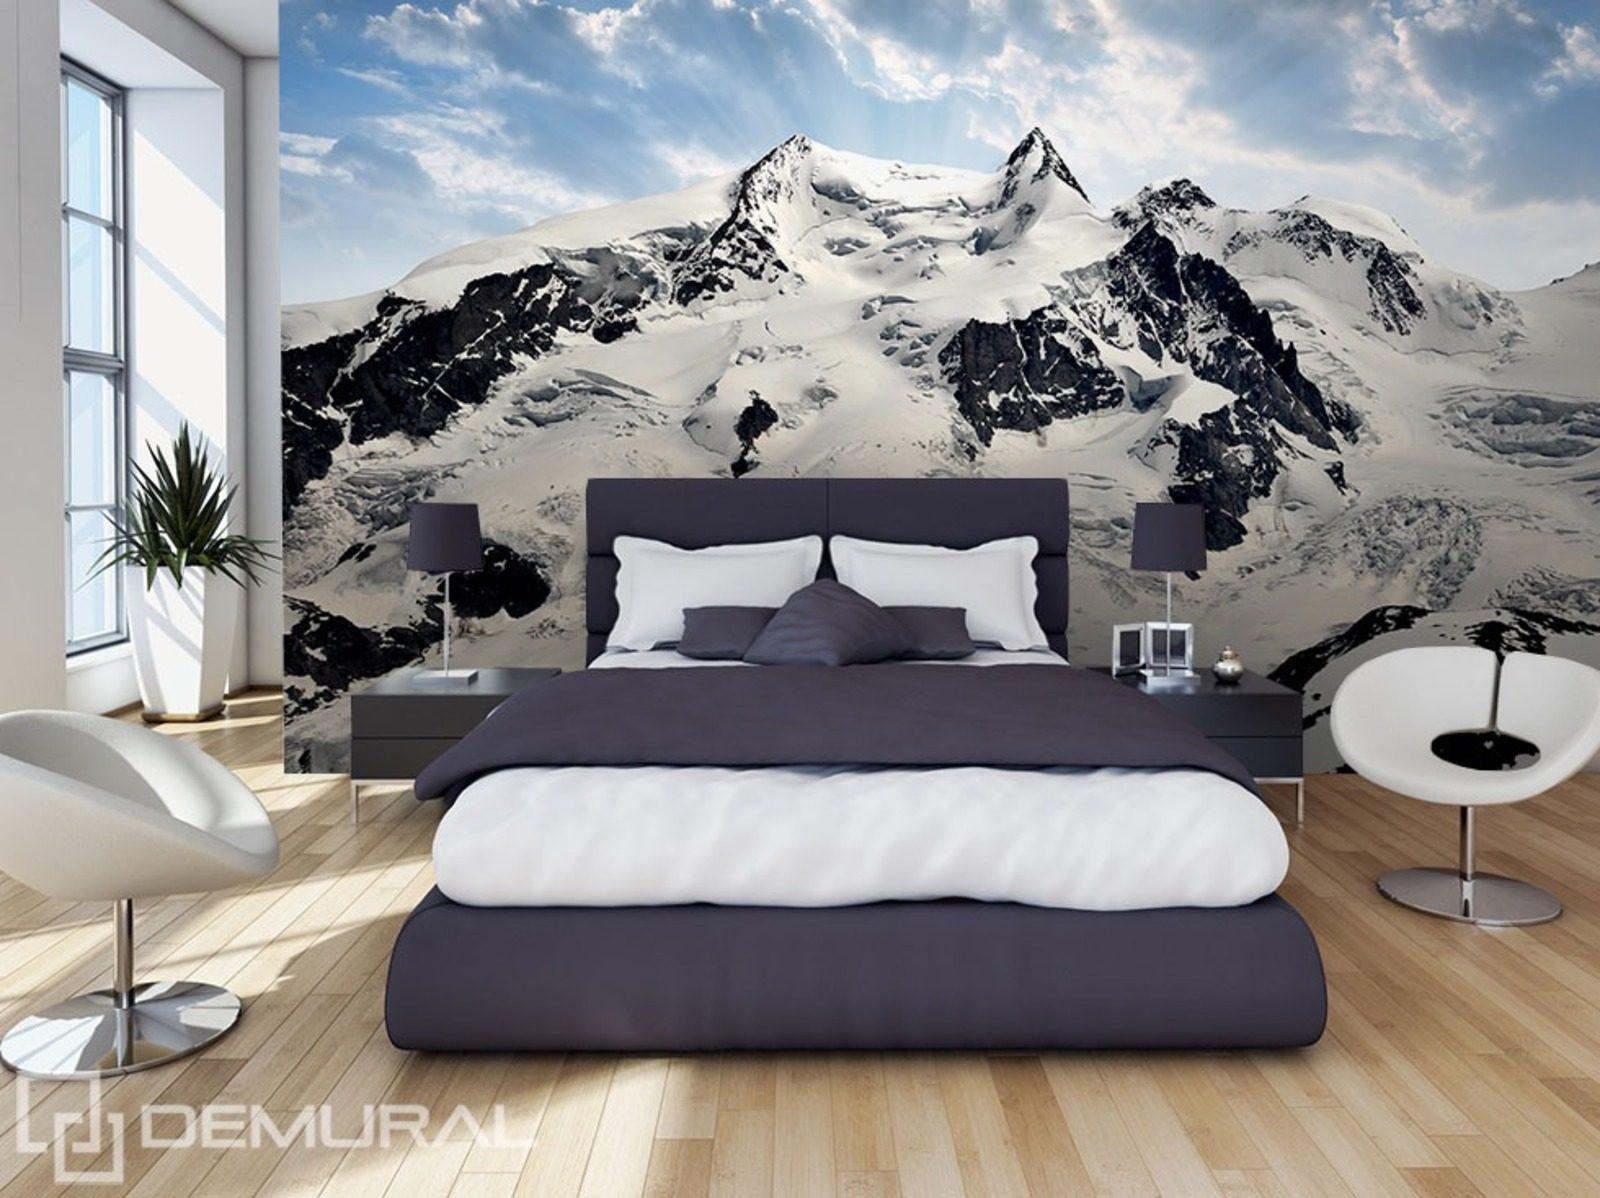 fototapete wohnzimmer fototapete wohnzimmer motiv luxus. Black Bedroom Furniture Sets. Home Design Ideas